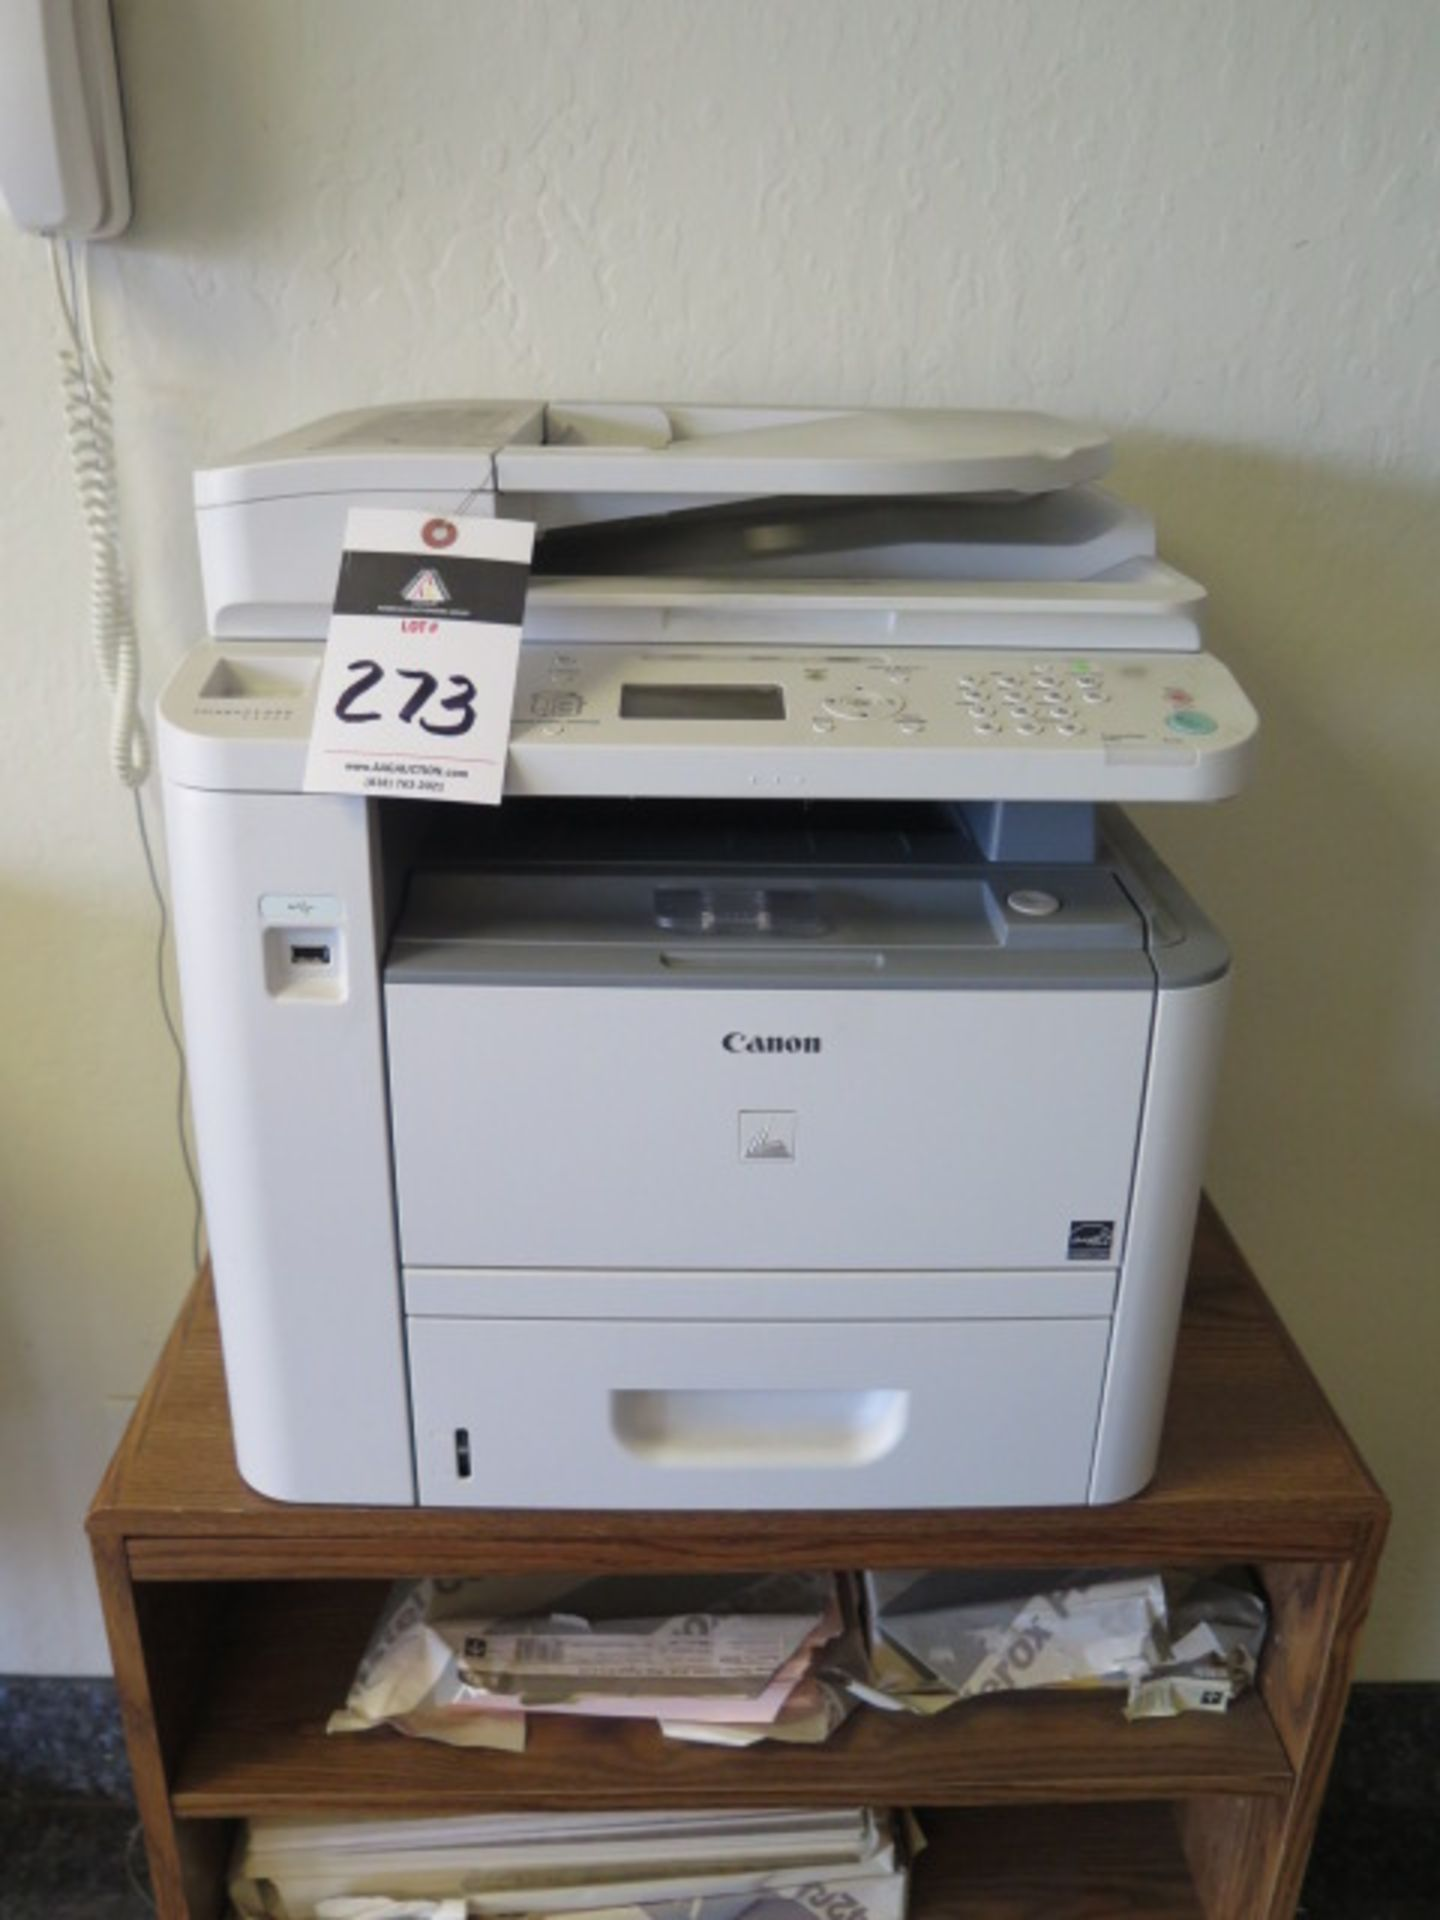 Lot 273 - Canon ImageCLASS D1320 Copier/Printer